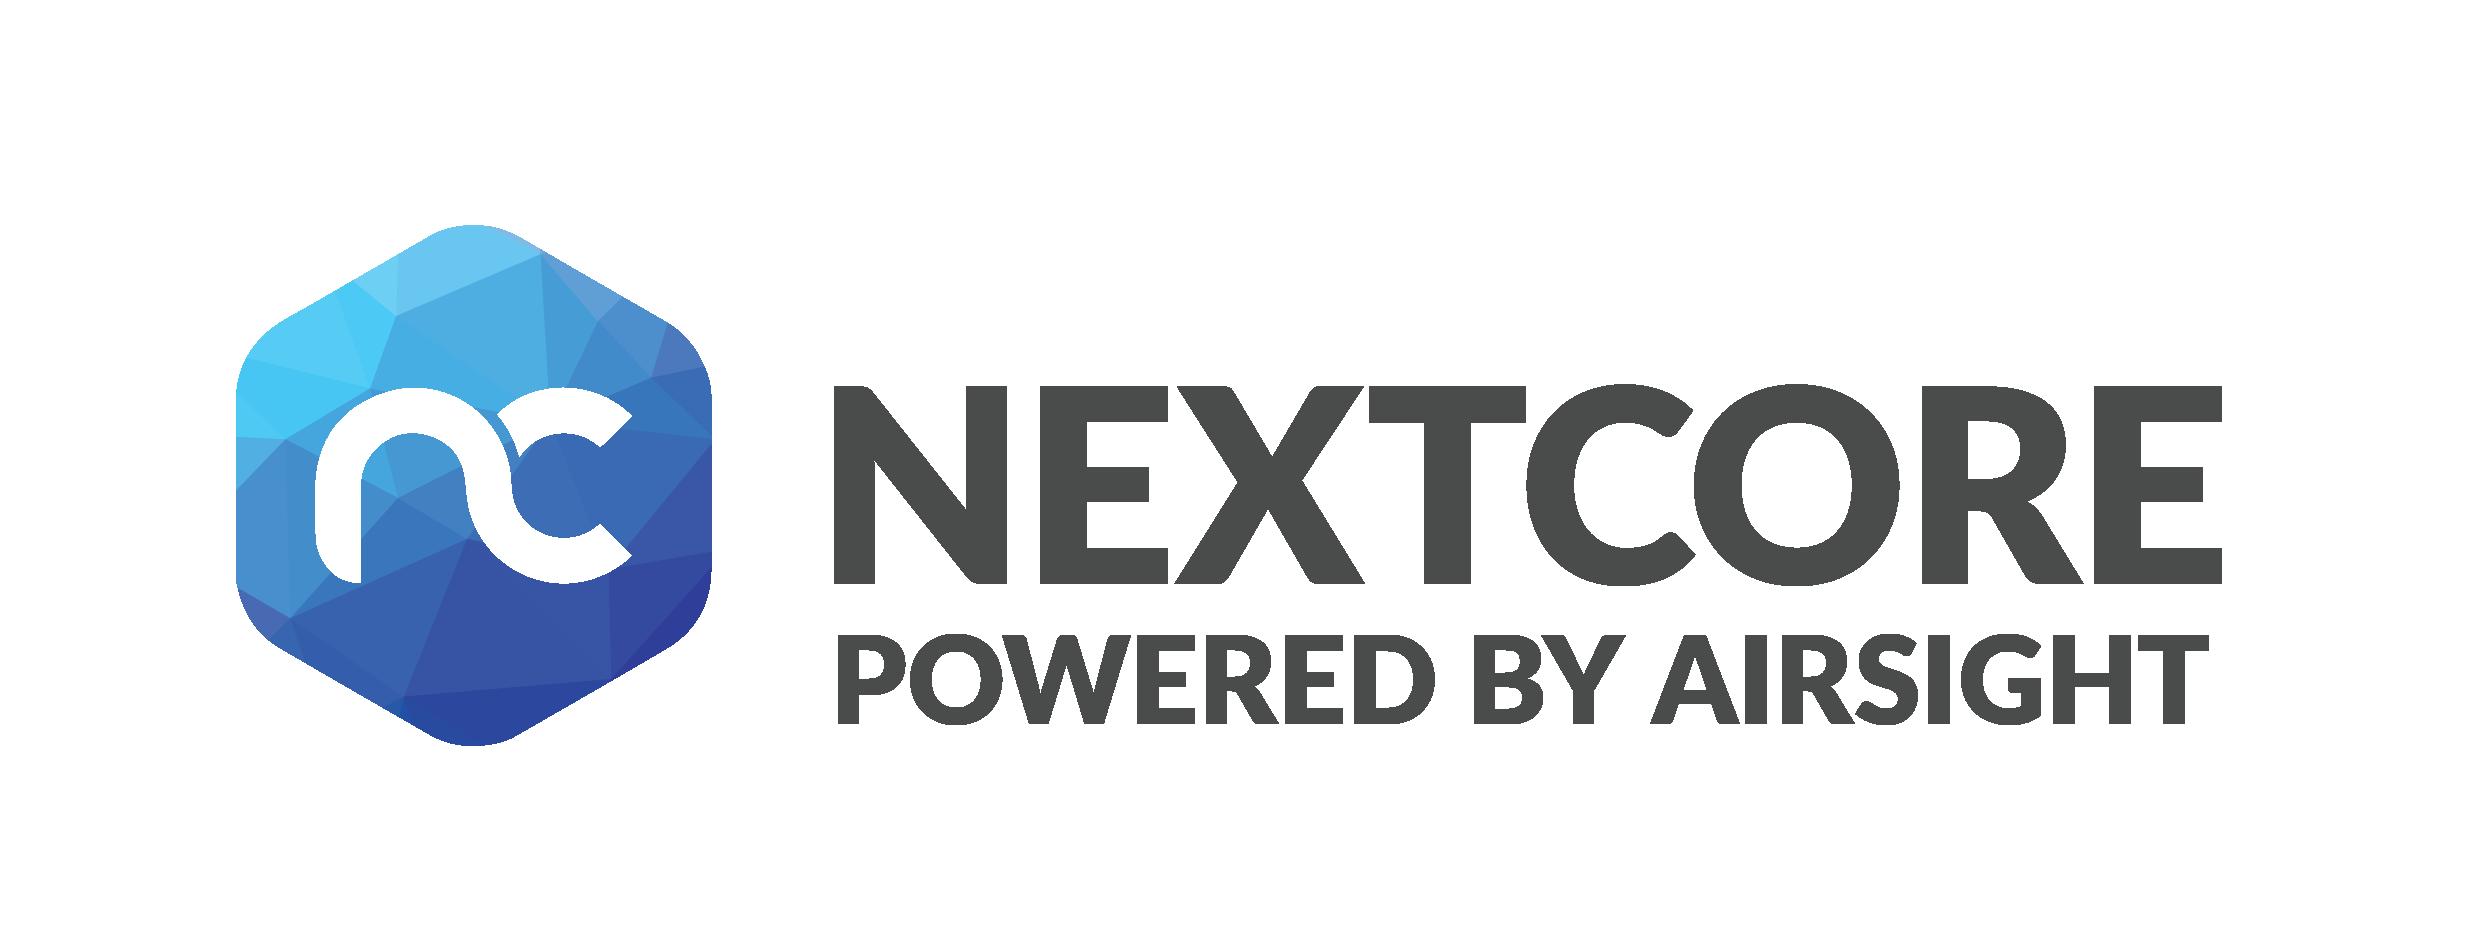 NextCore_Logo_[2.1]_-_white-01.png